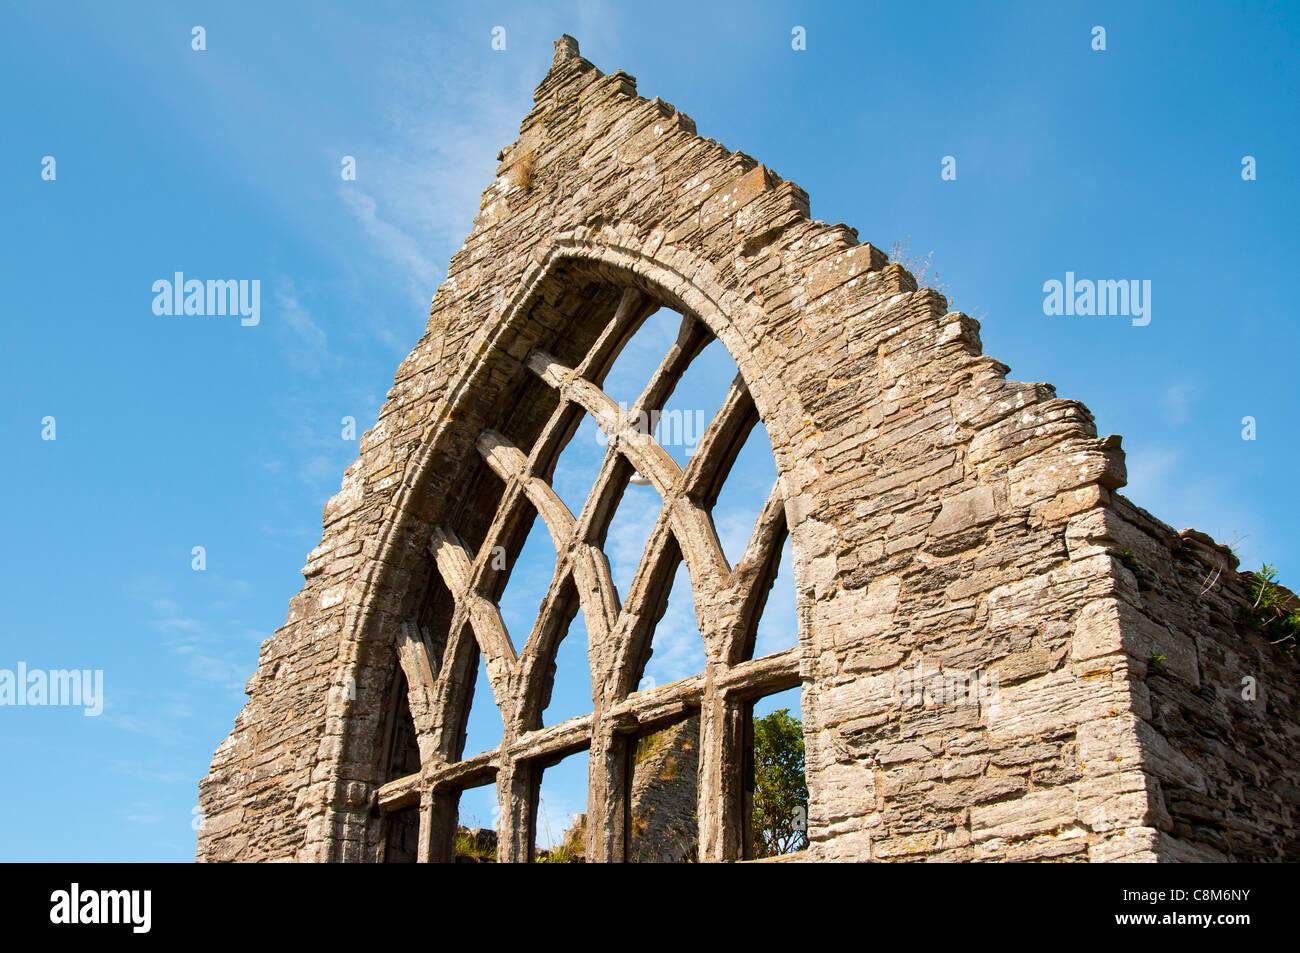 The ruins of St. Peter's Church, circa 1220, Thurso, Caithness, Scotland, UK - Stock Image